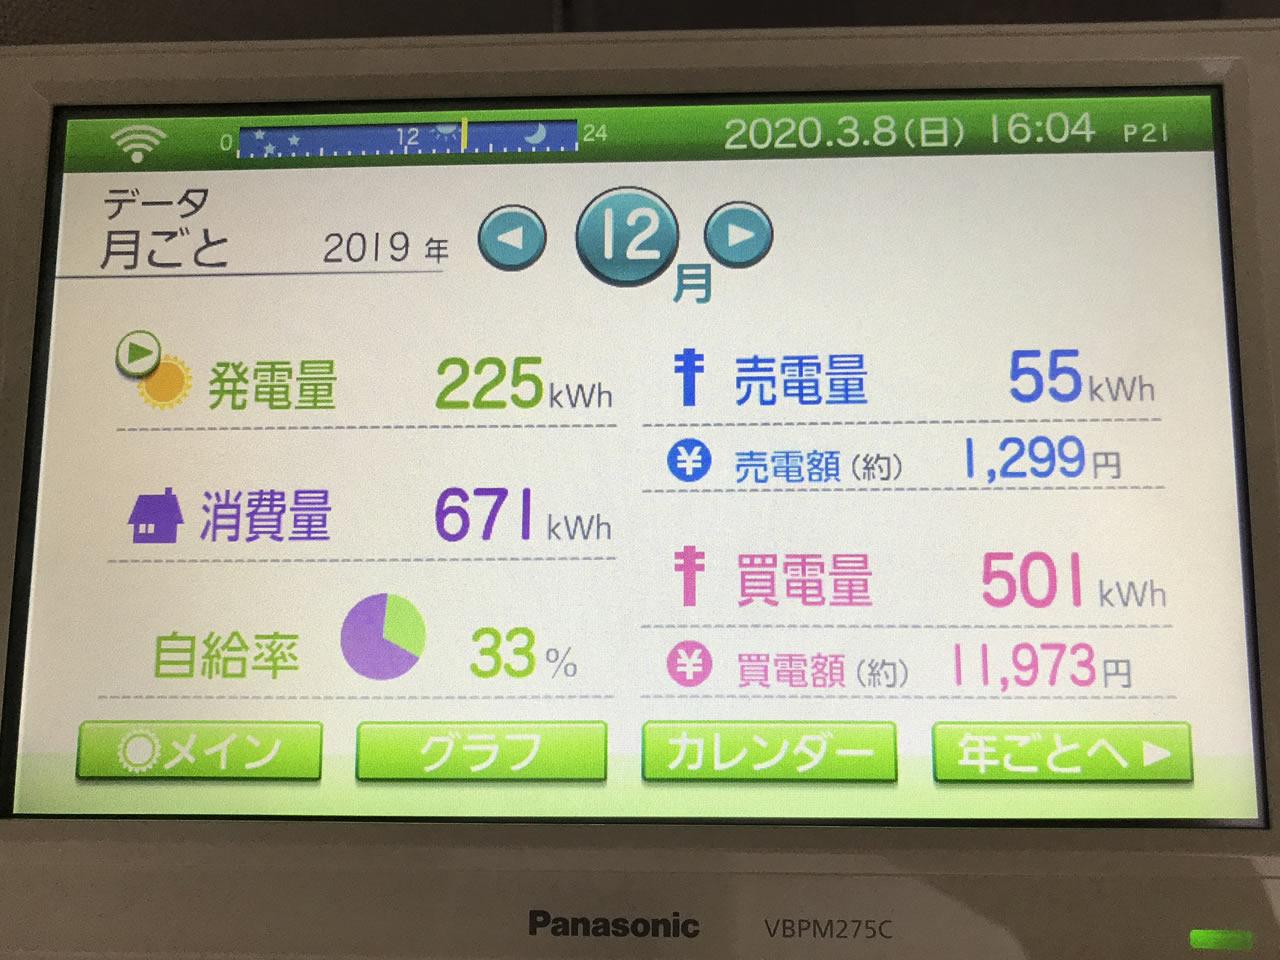 売電開始3ヶ月目(2019年12月)の売電結果